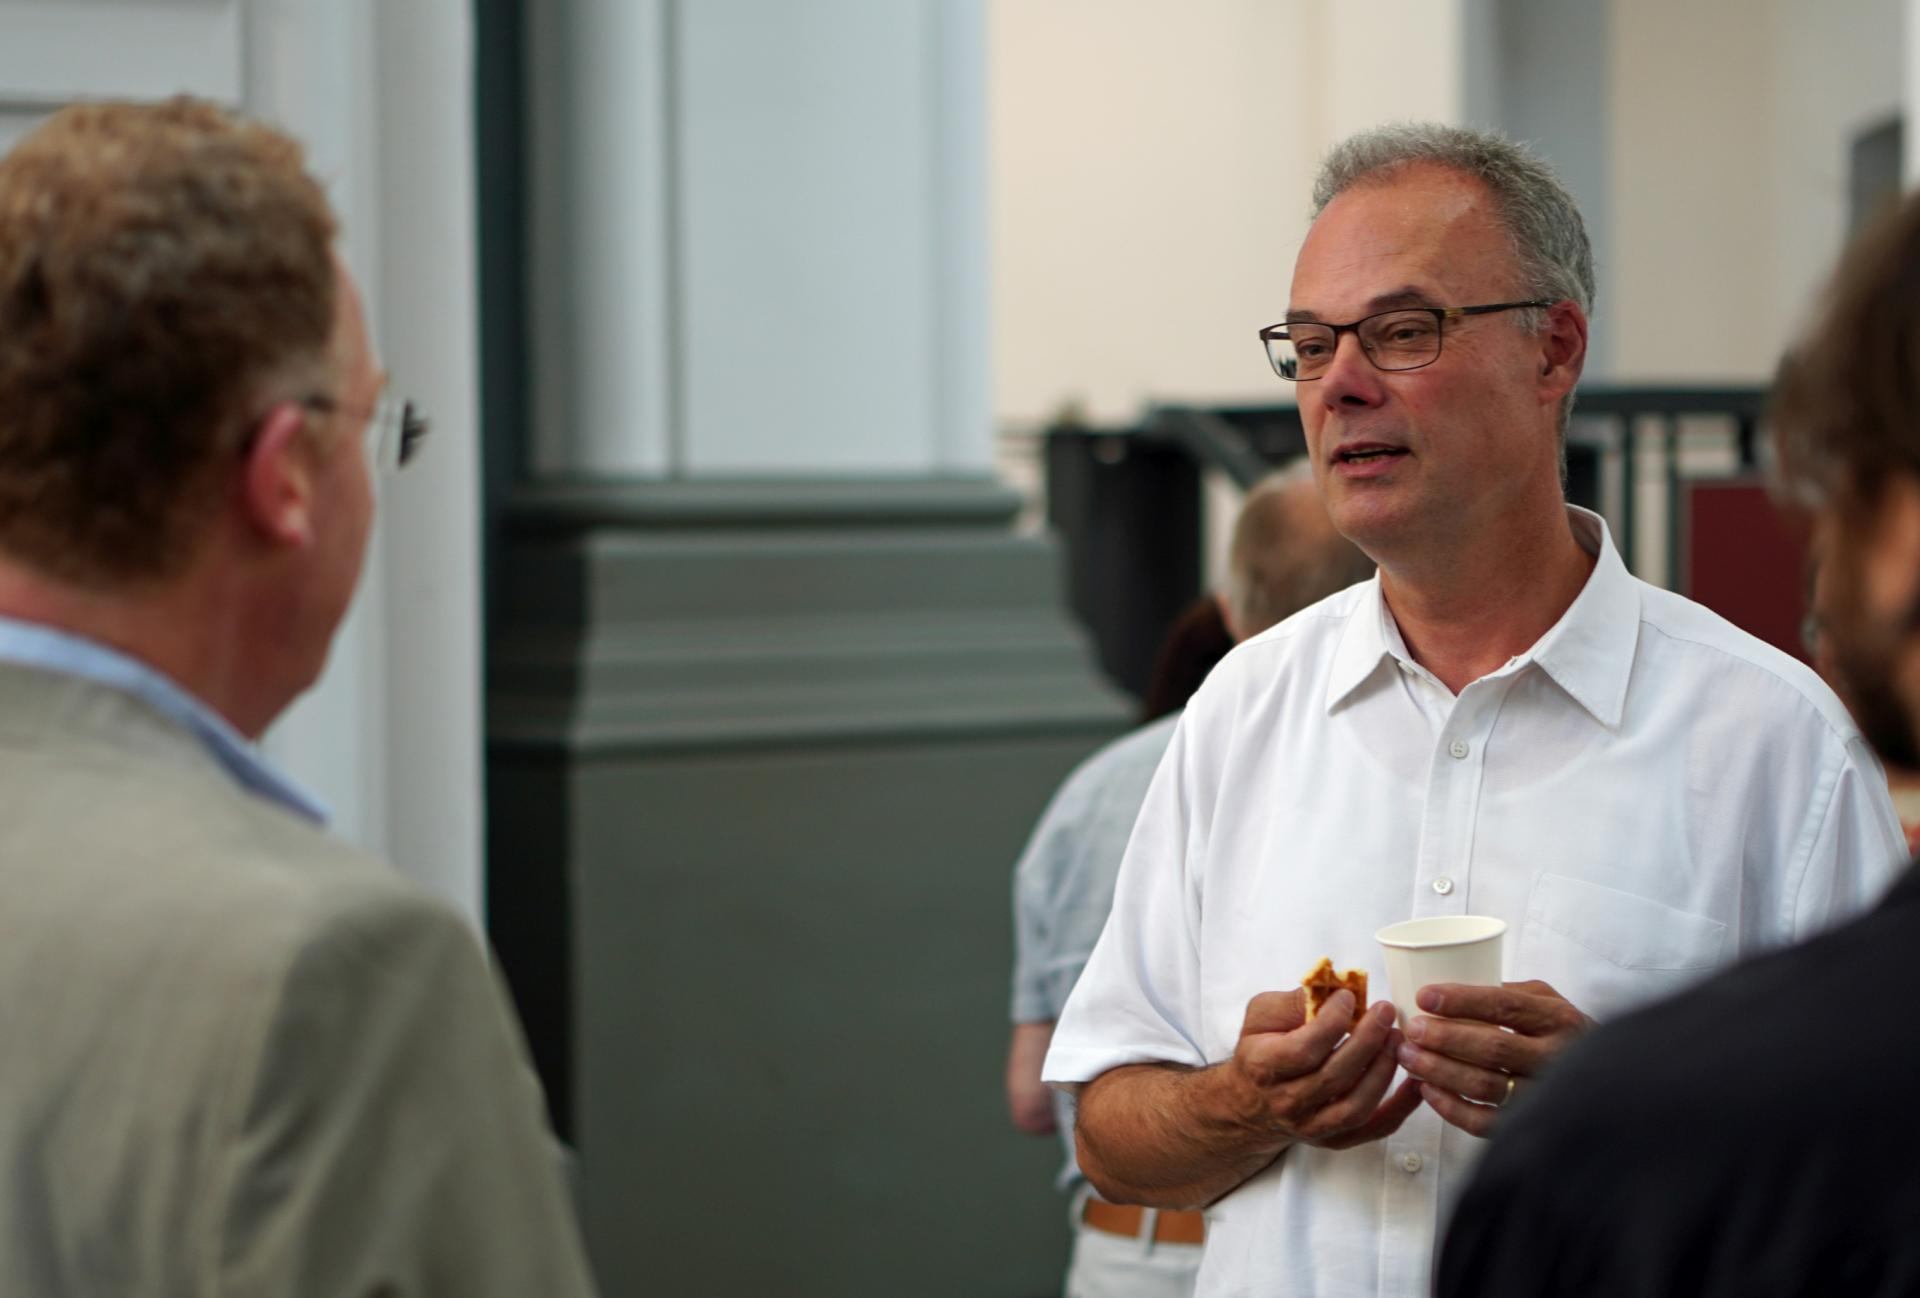 Dr. Andreas Goetze